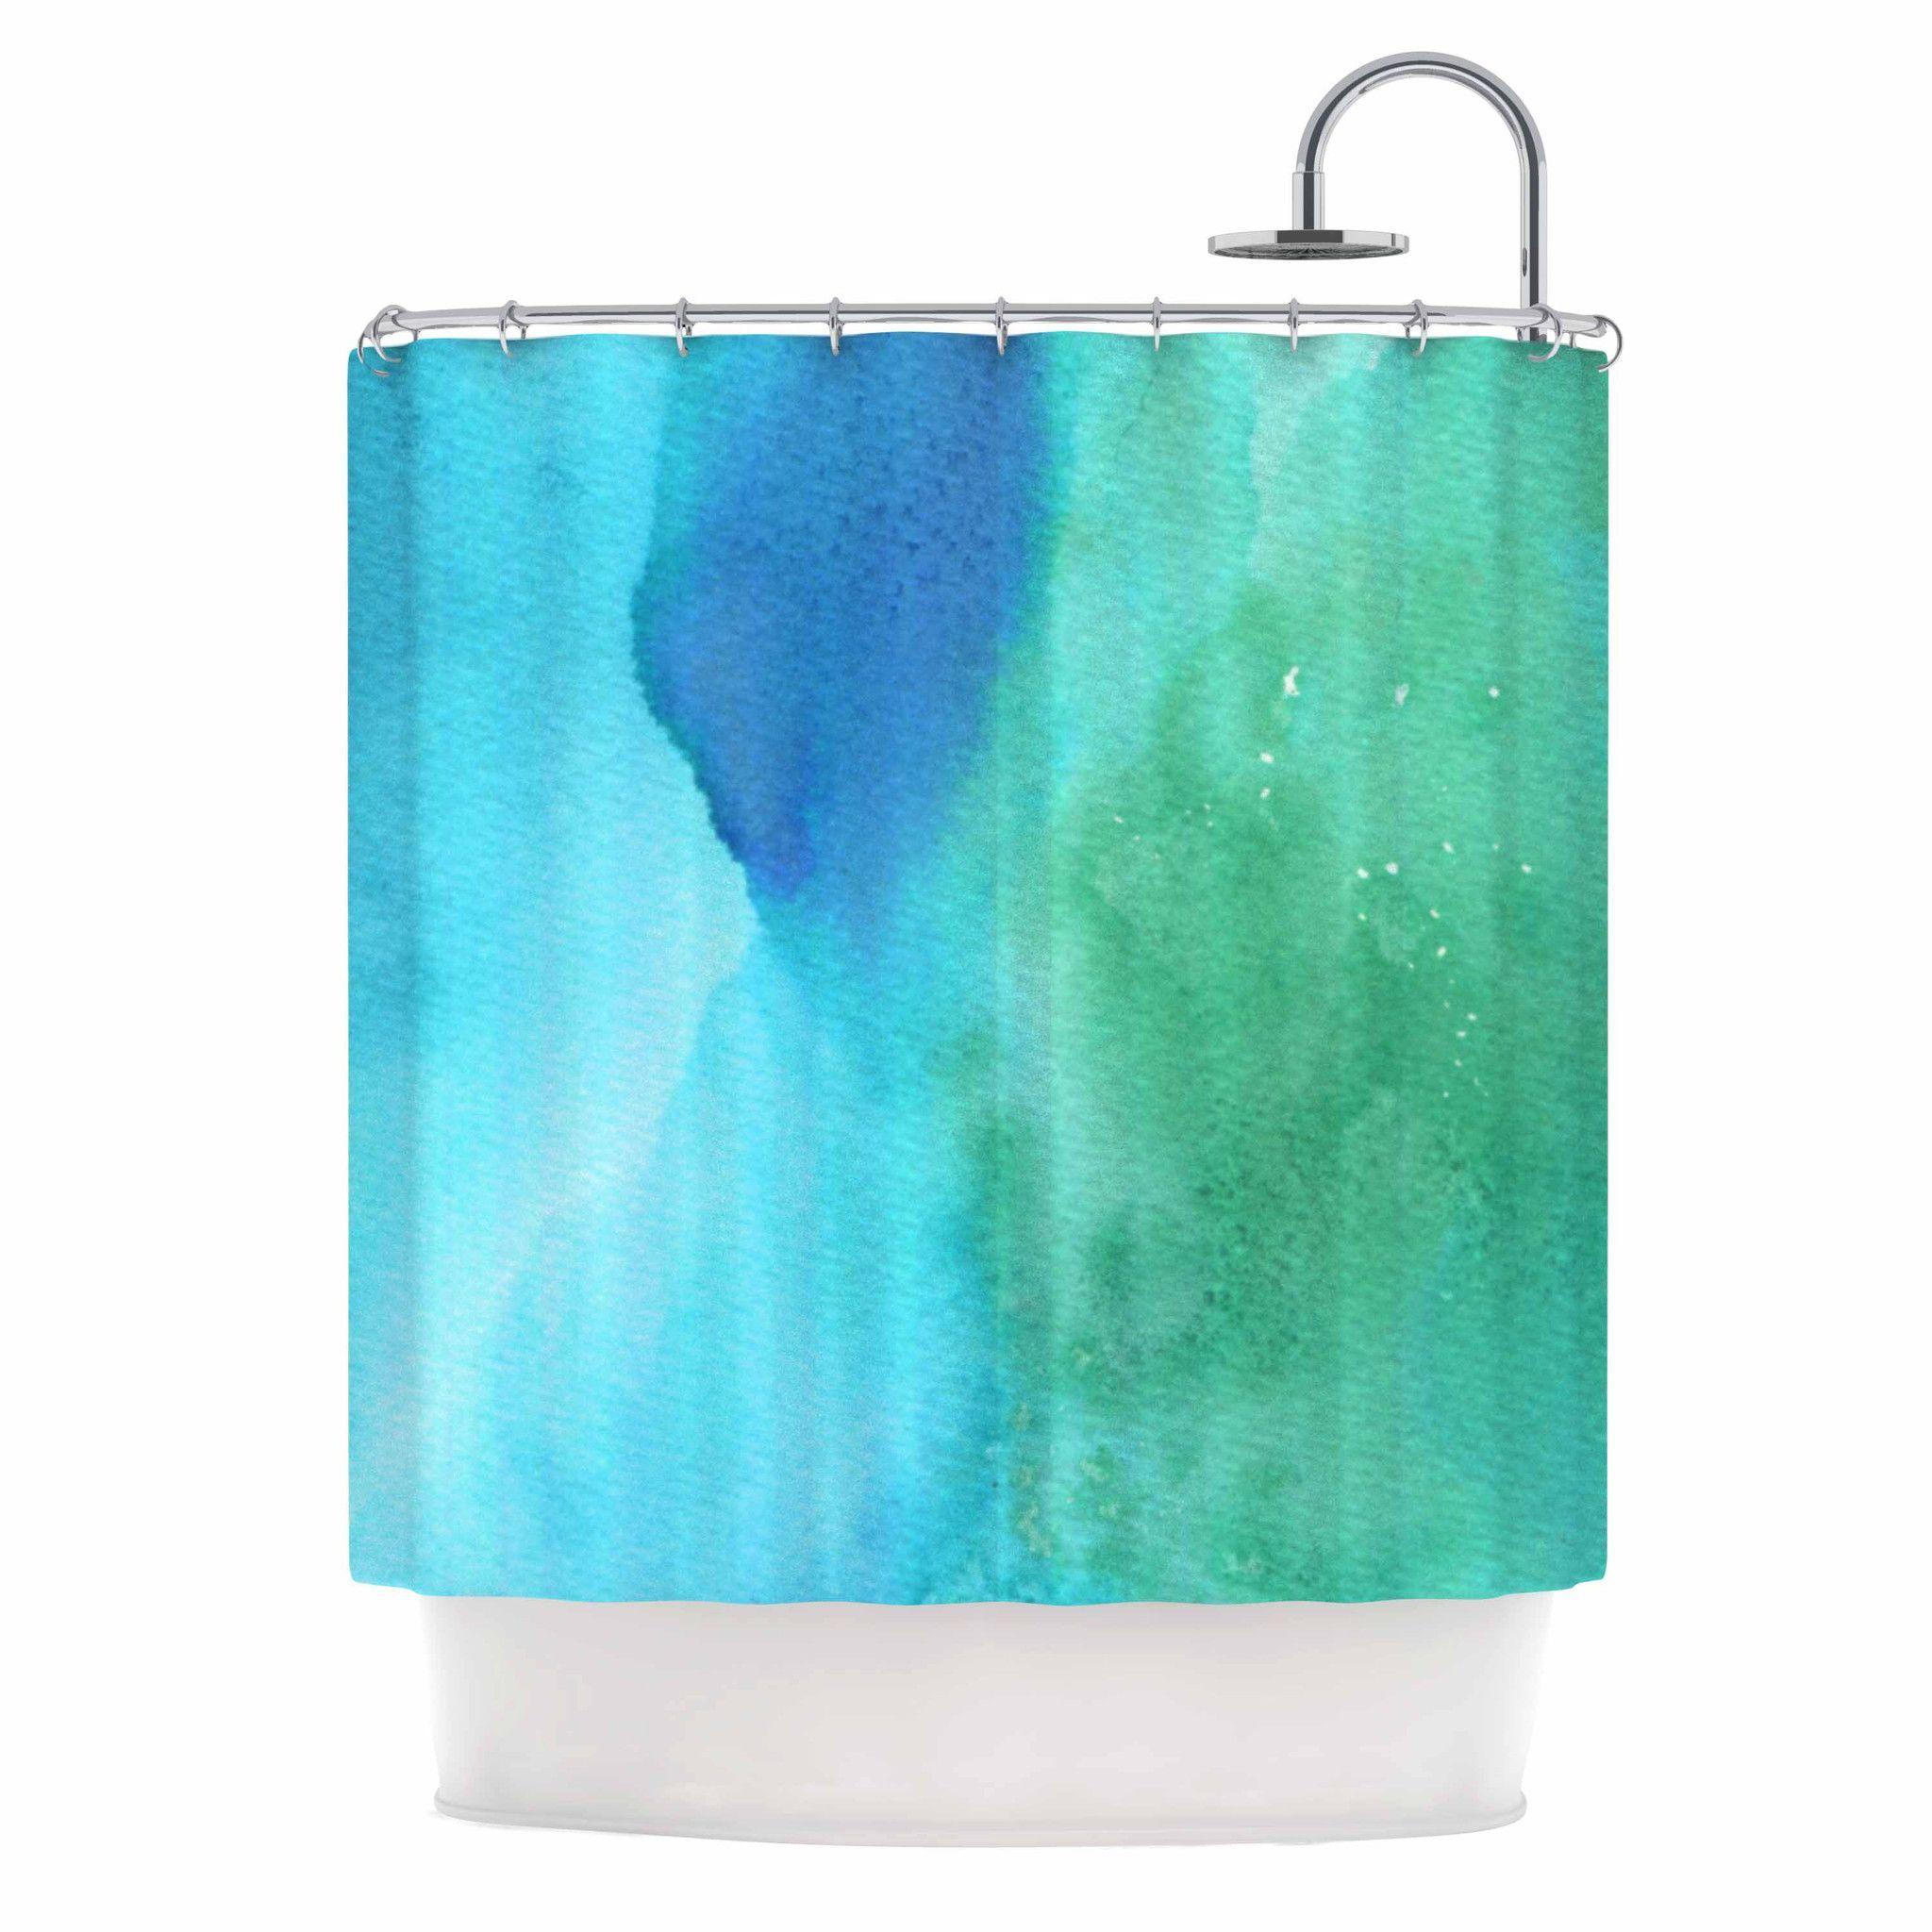 Li Zamperini Marine Green Blue Shower Curtain